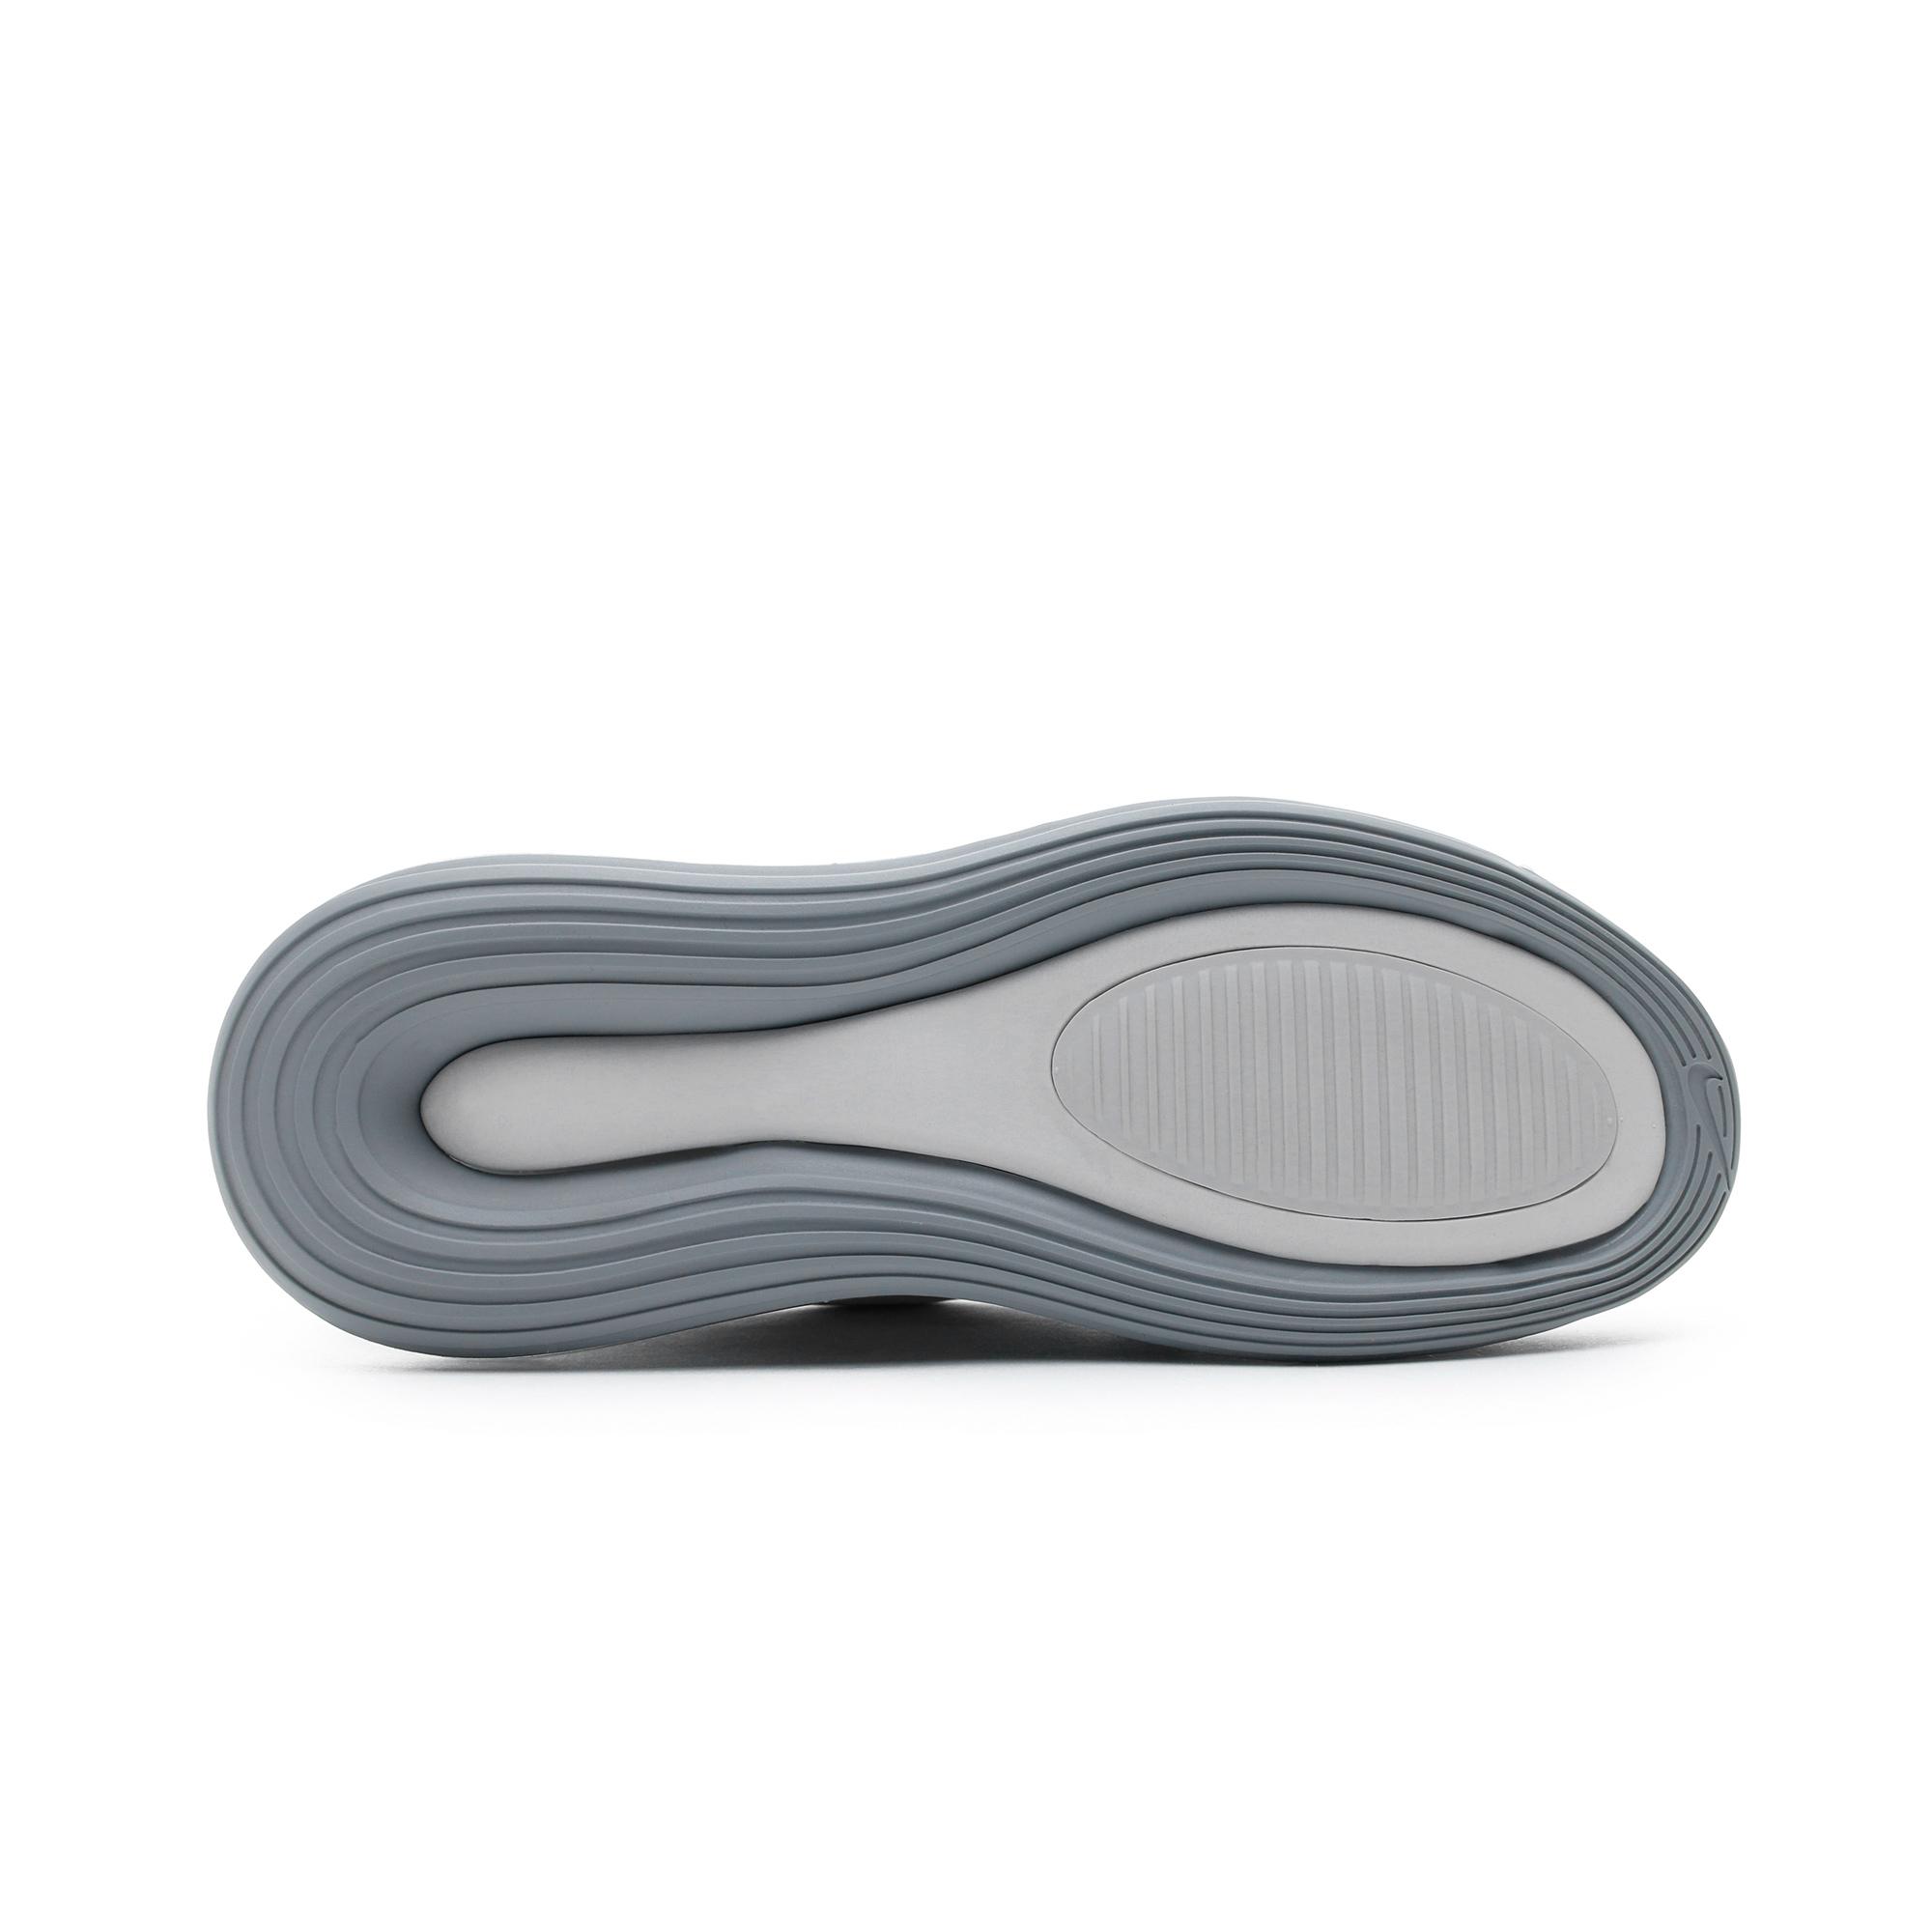 Nike Air Max 720 Gri Erkek Spor Ayakkabı